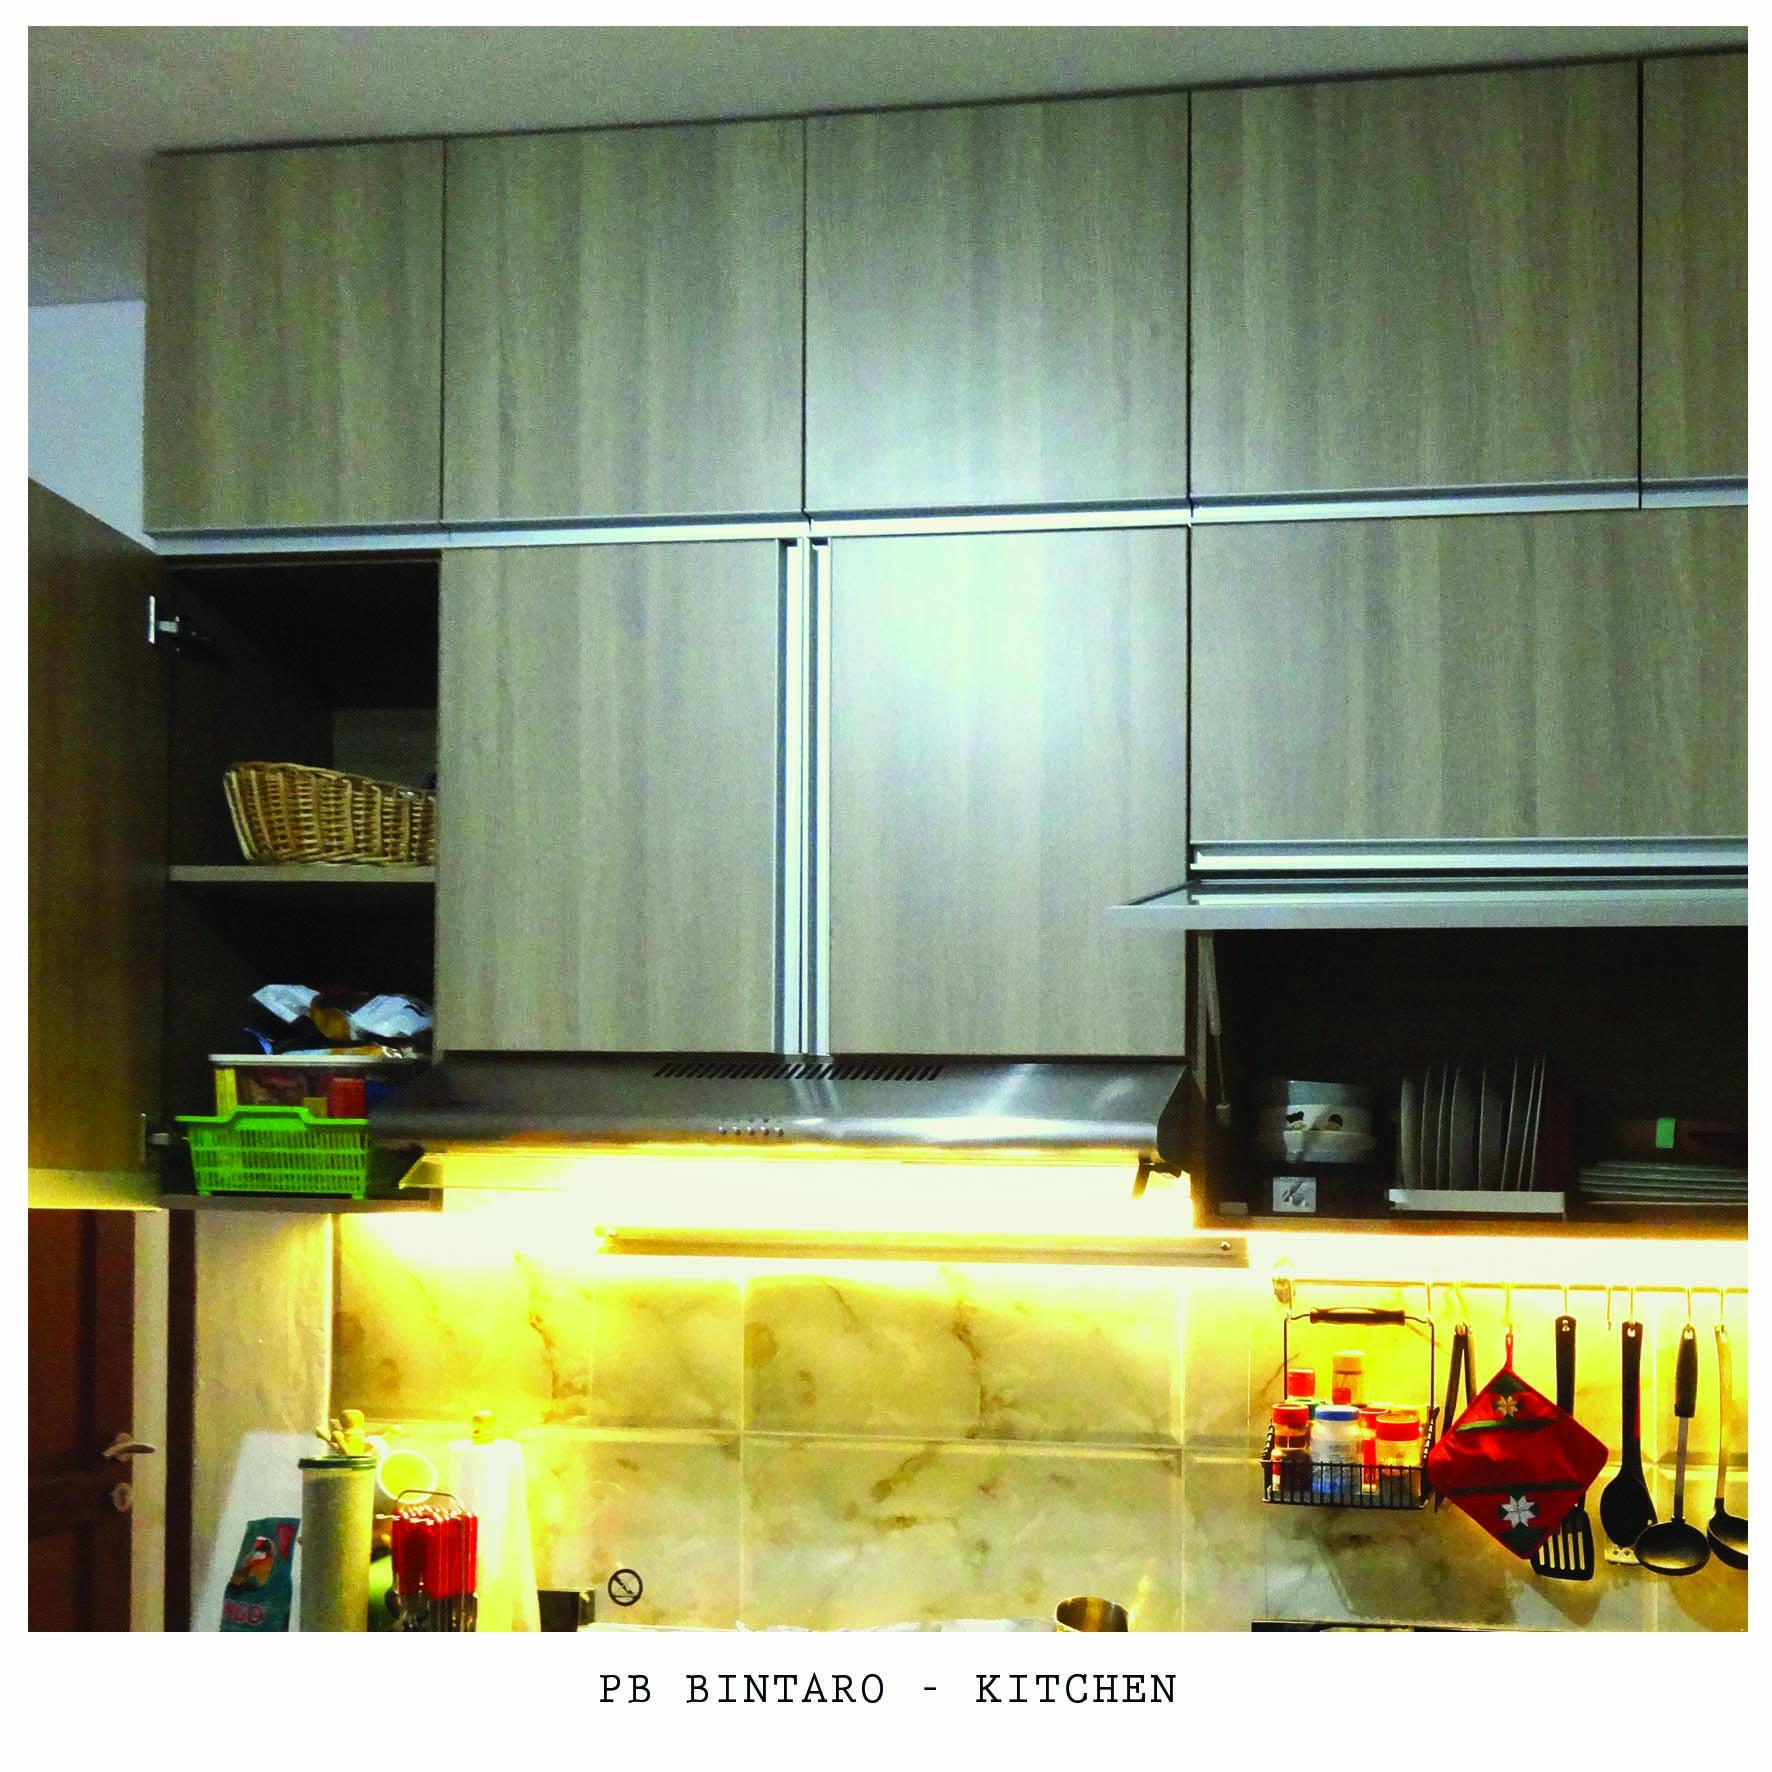 X3M Architects Pb 6 House Bintaro Bintaro X3M-Architects-Pb-6-House  75951